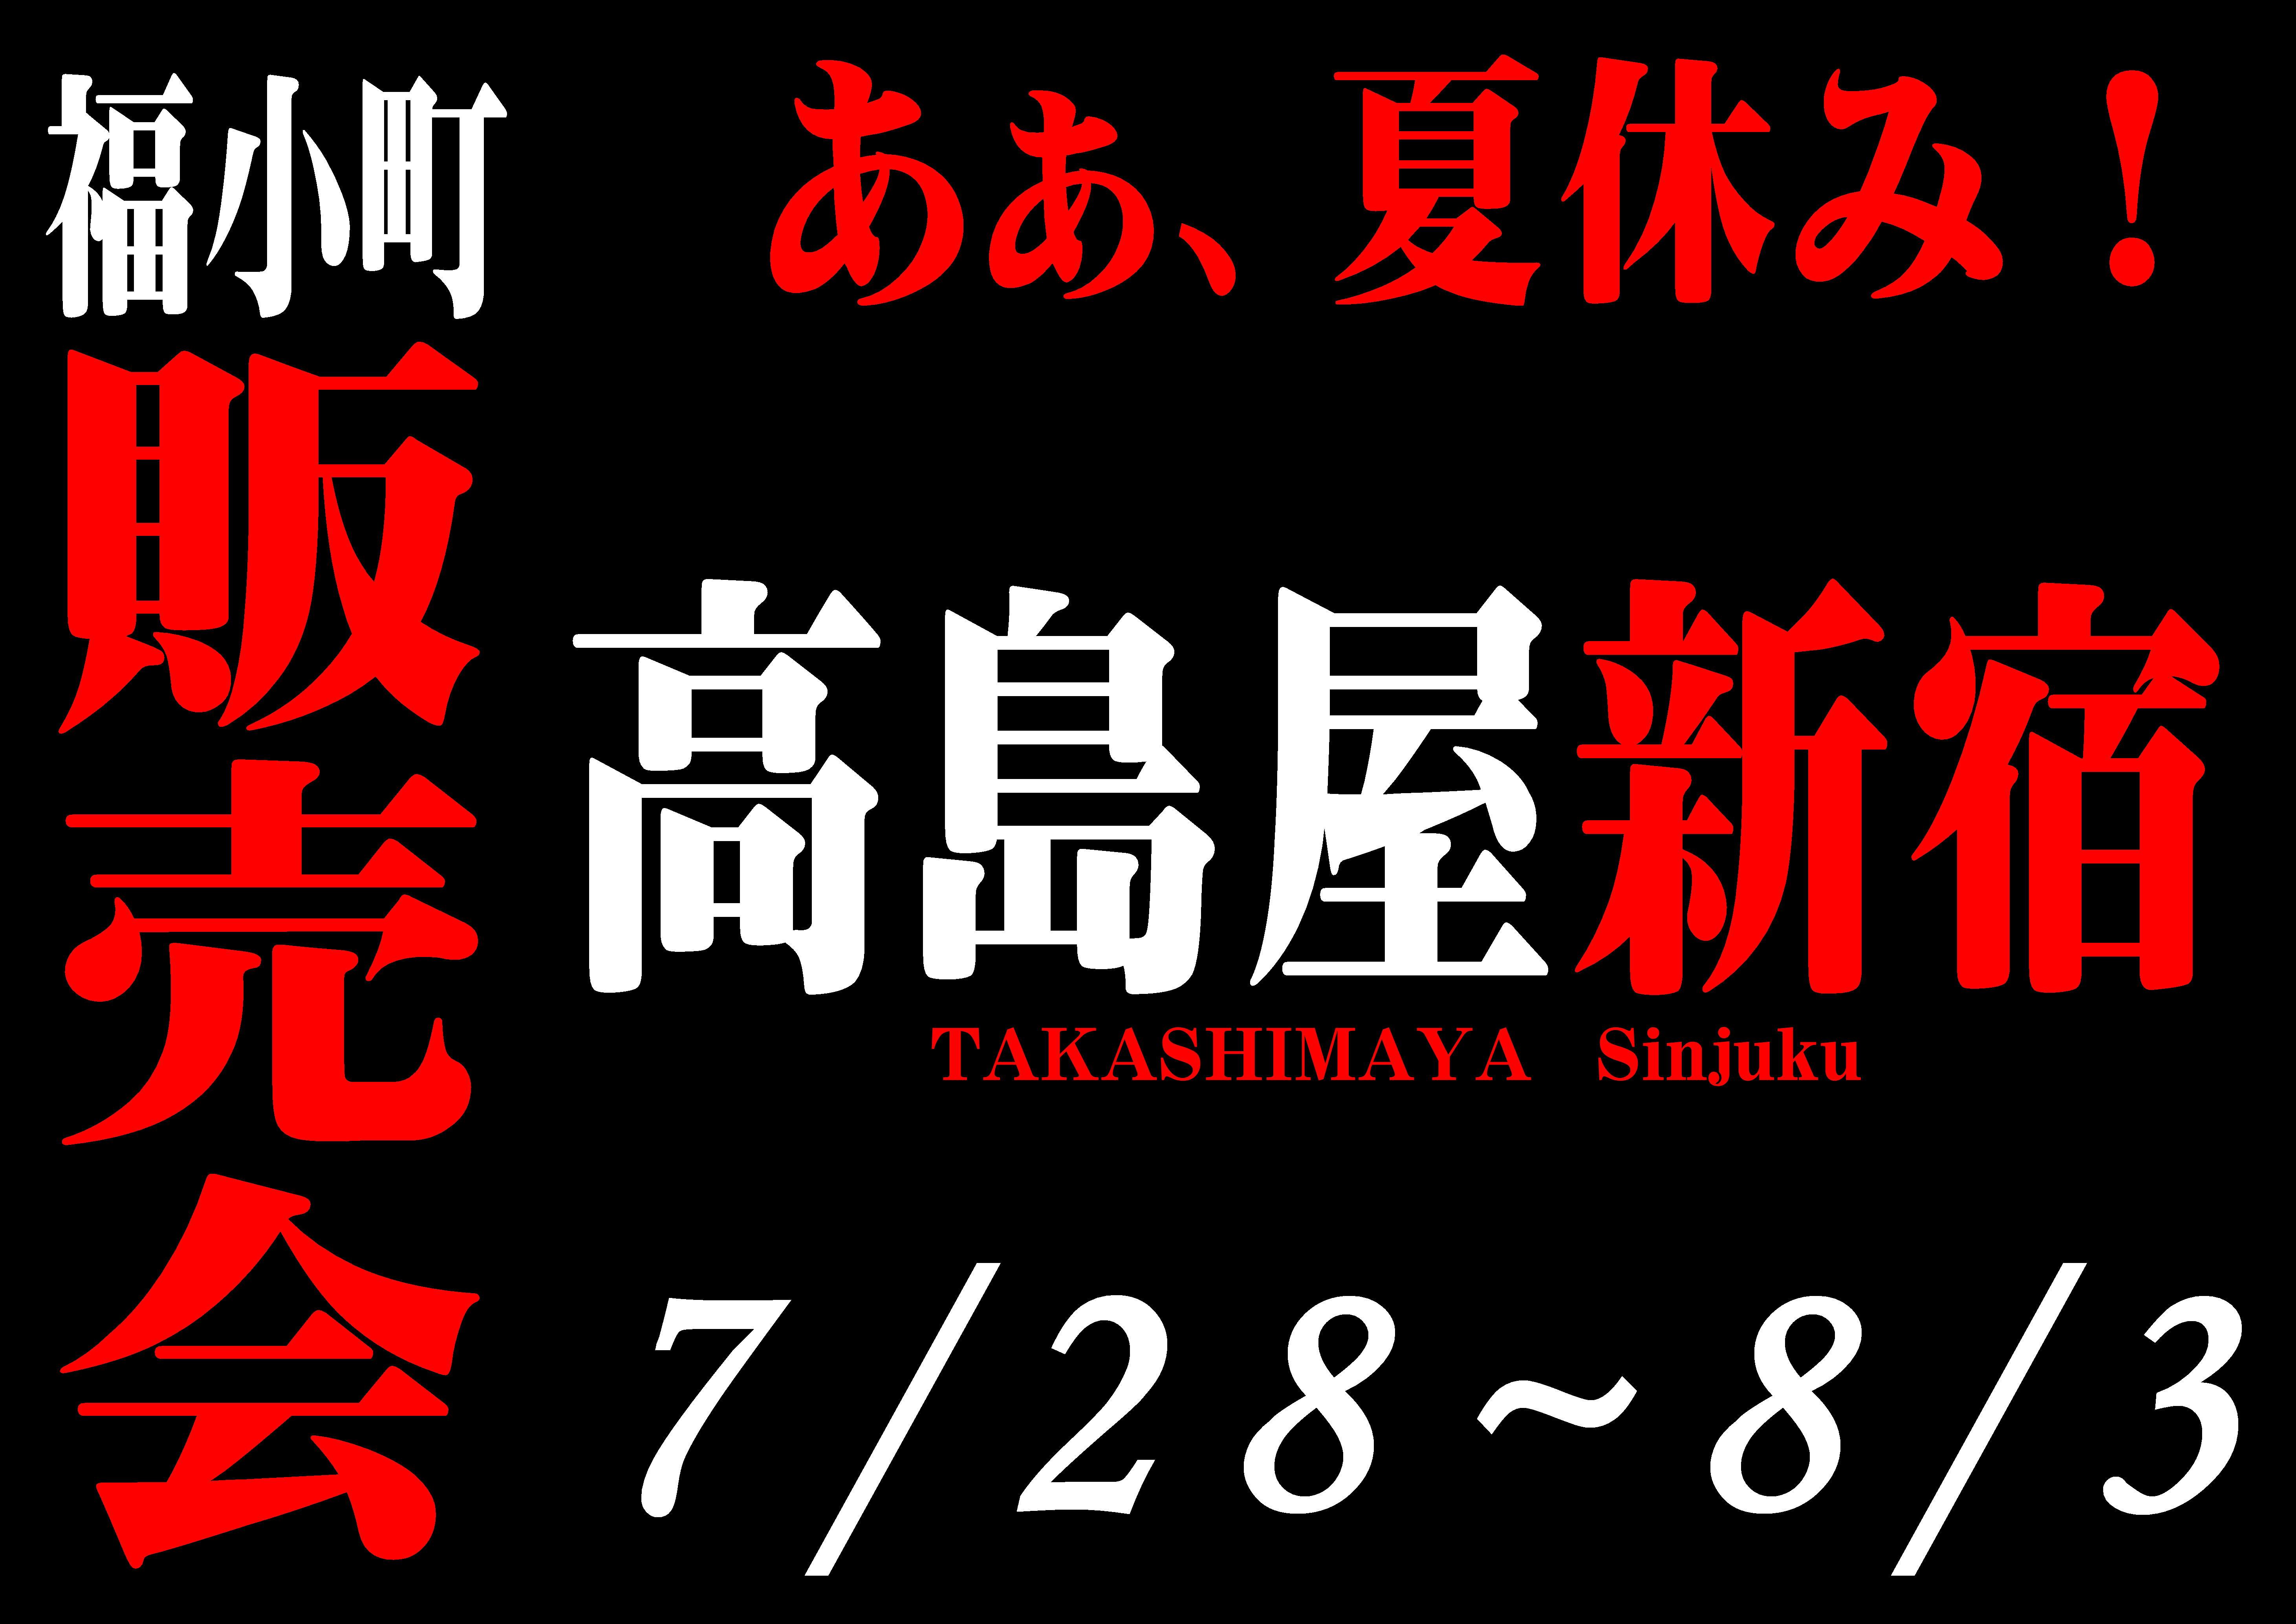 http://www.fukukomachi.com/blog/photo/20210729.JPG